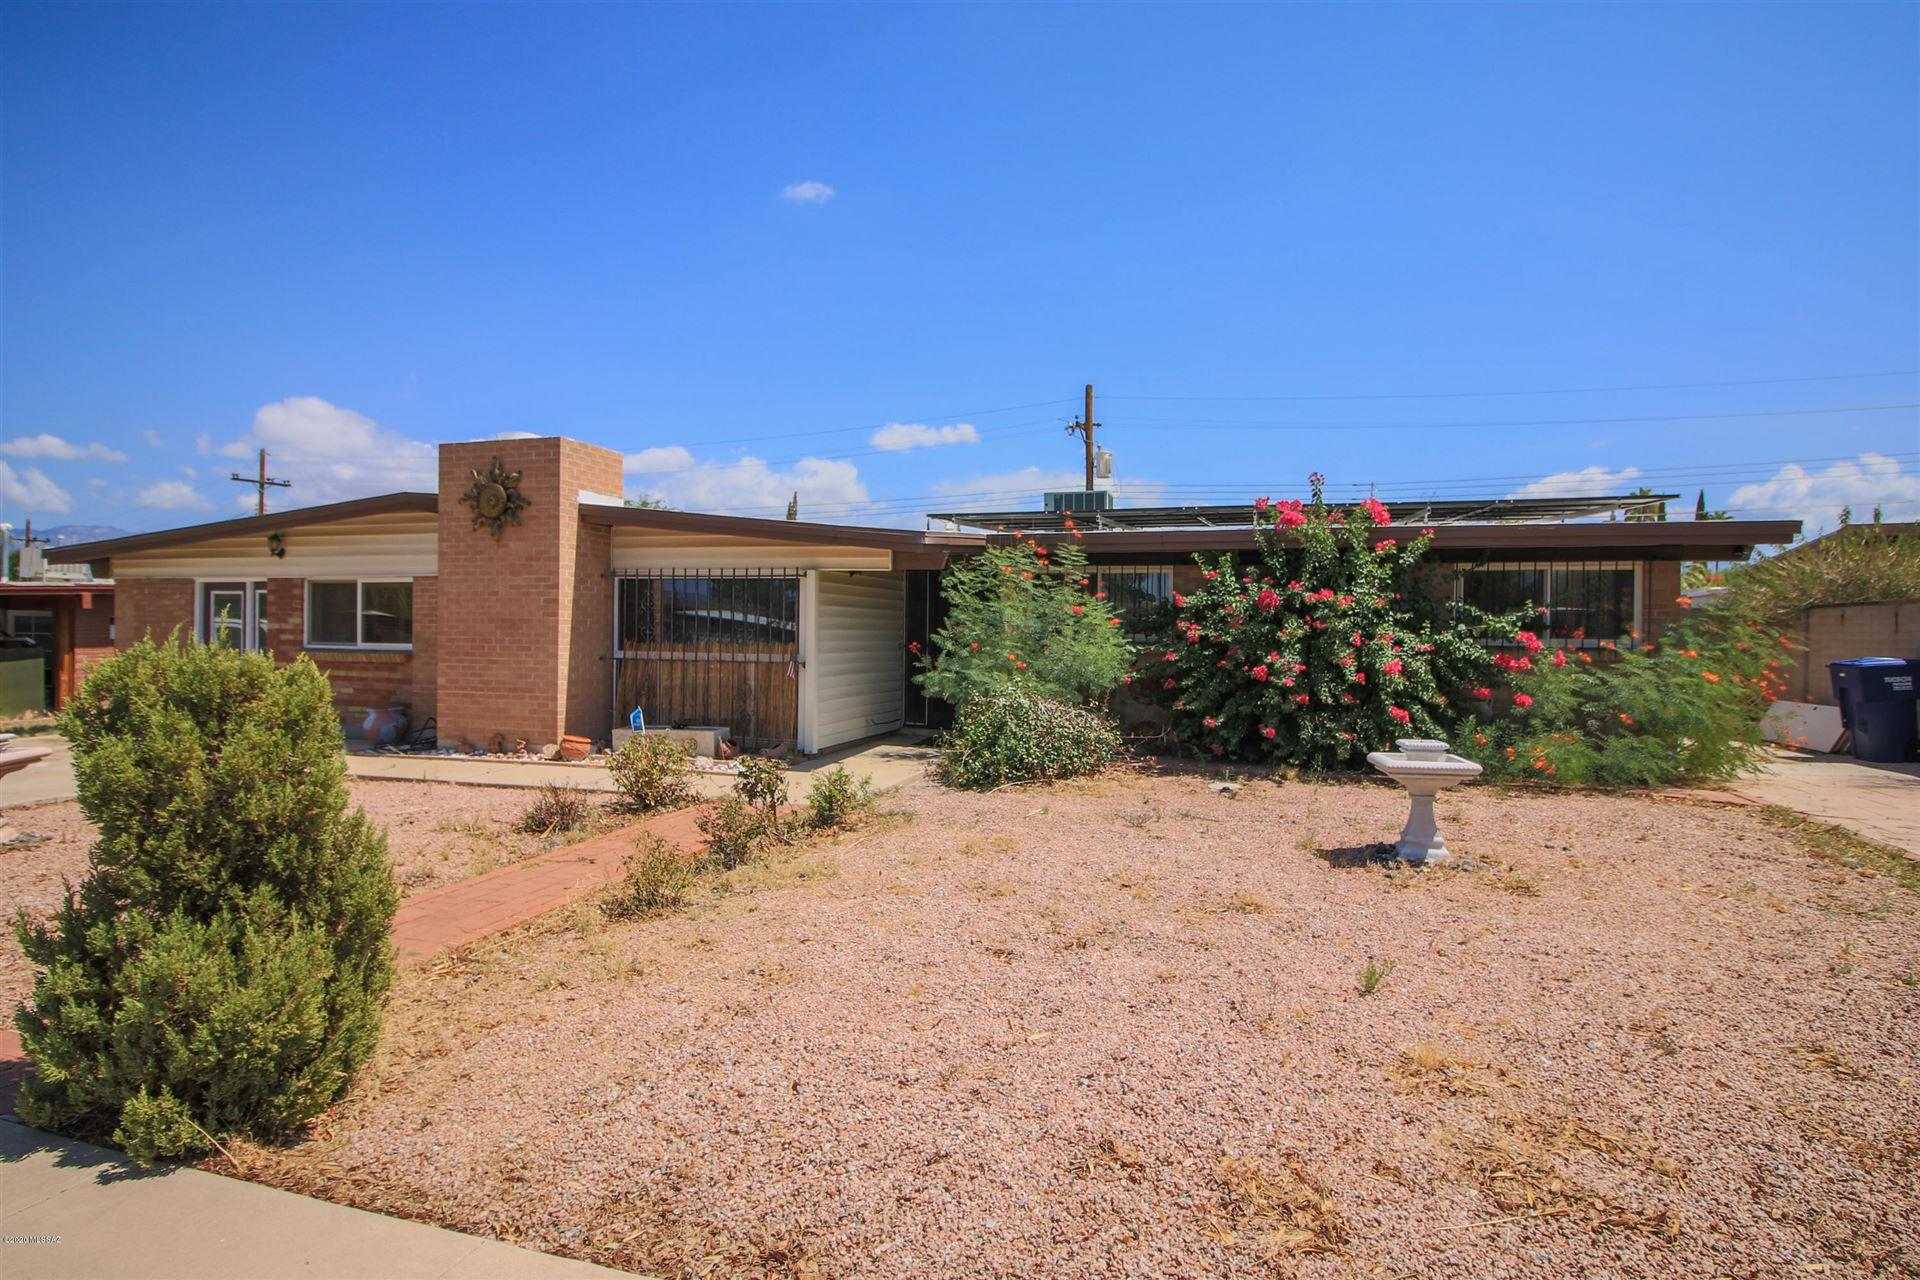 45 S Evelyn Avenue, Tucson, AZ 85710 - MLS#: 22022777